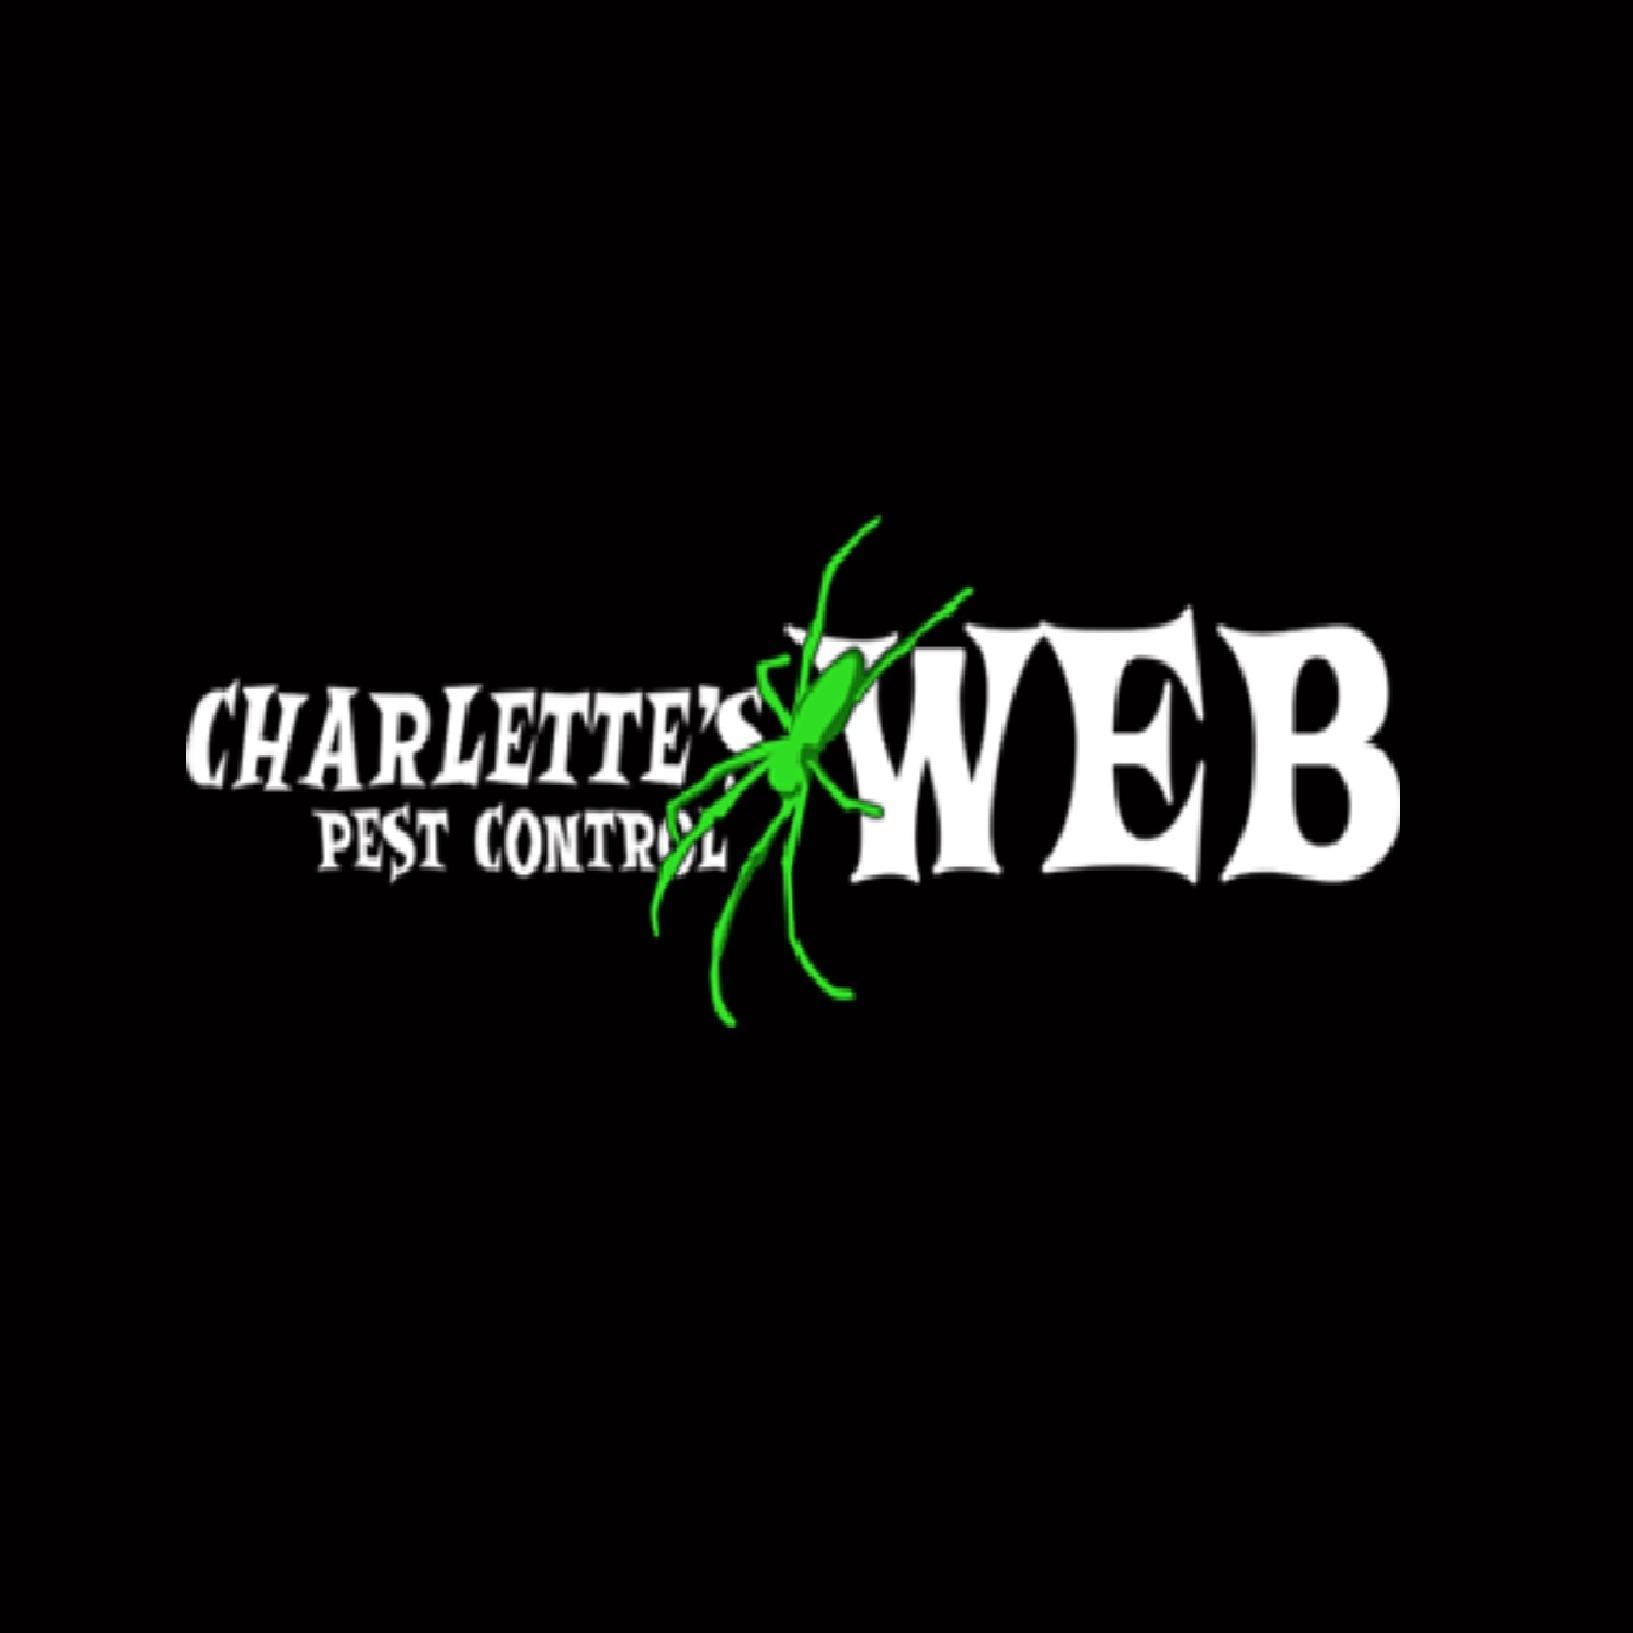 Charlette's Web Pest Control